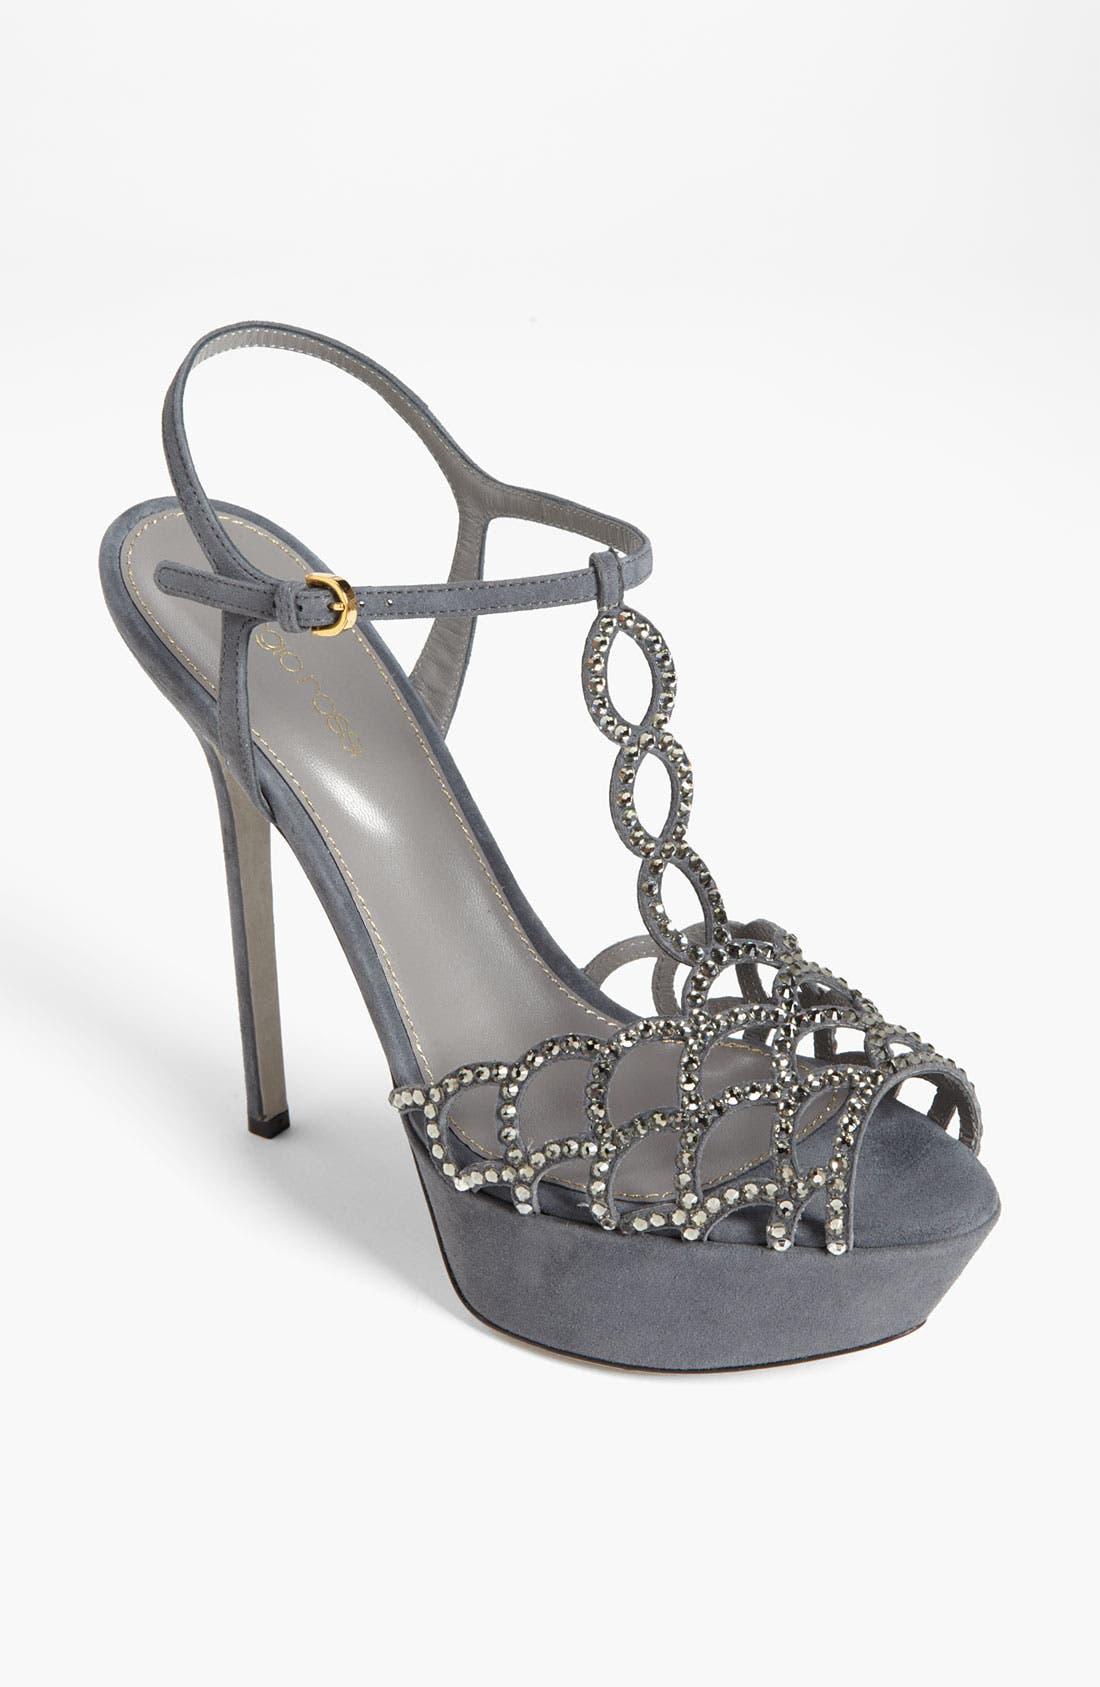 Main Image - Sergio Rossi 'Vague' Platform Sandal